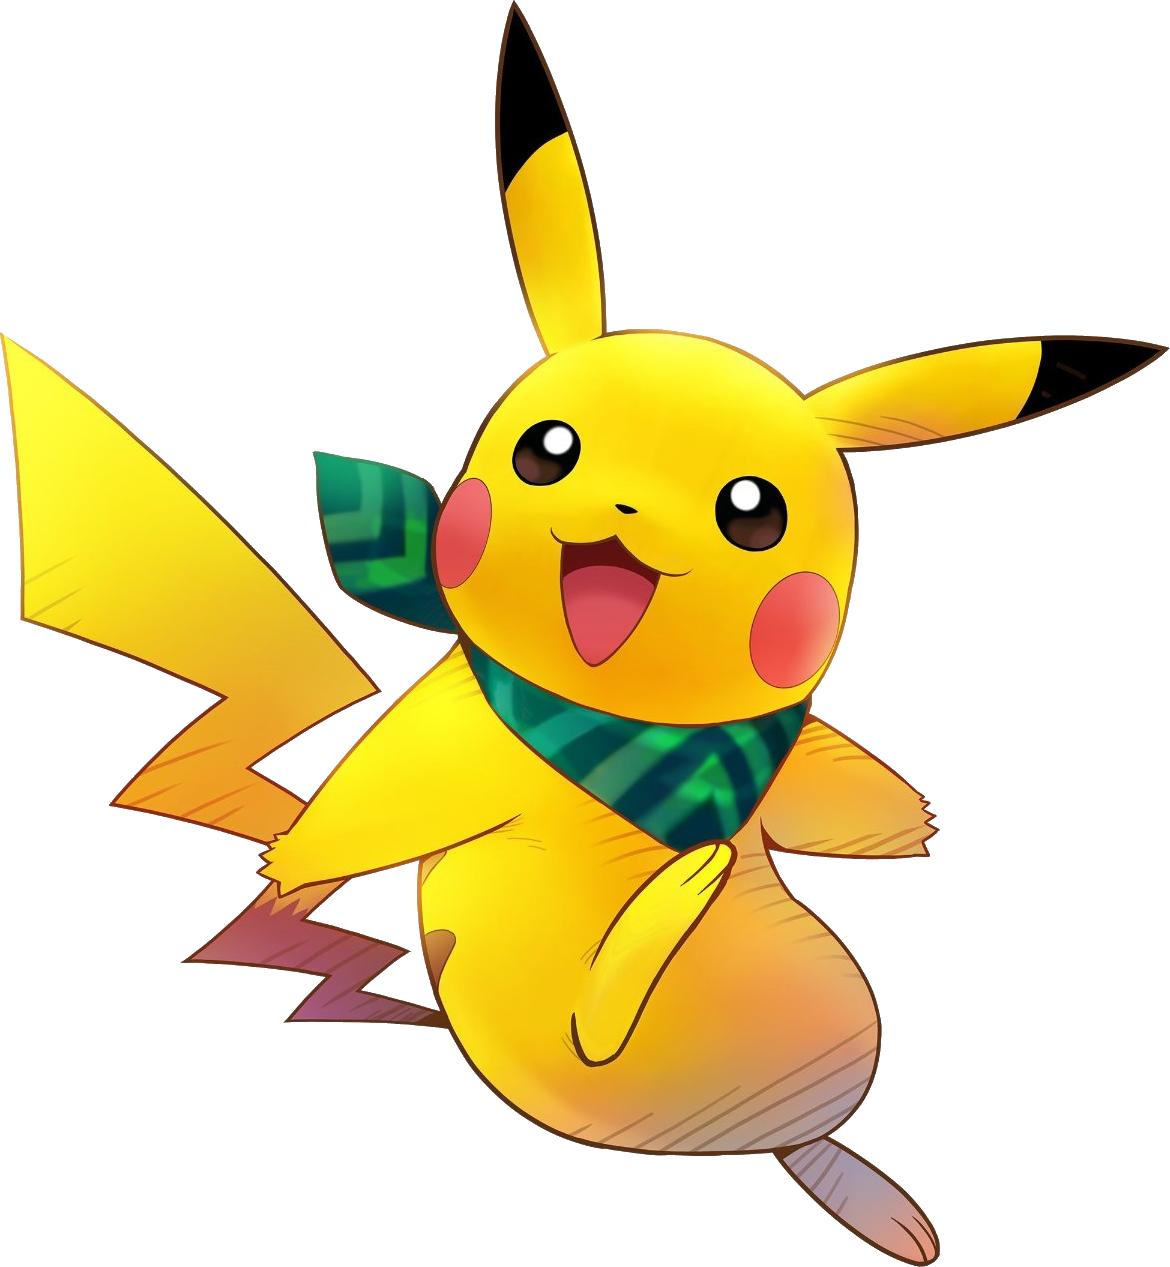 Review_PokemonSuperMysteryDungeon02